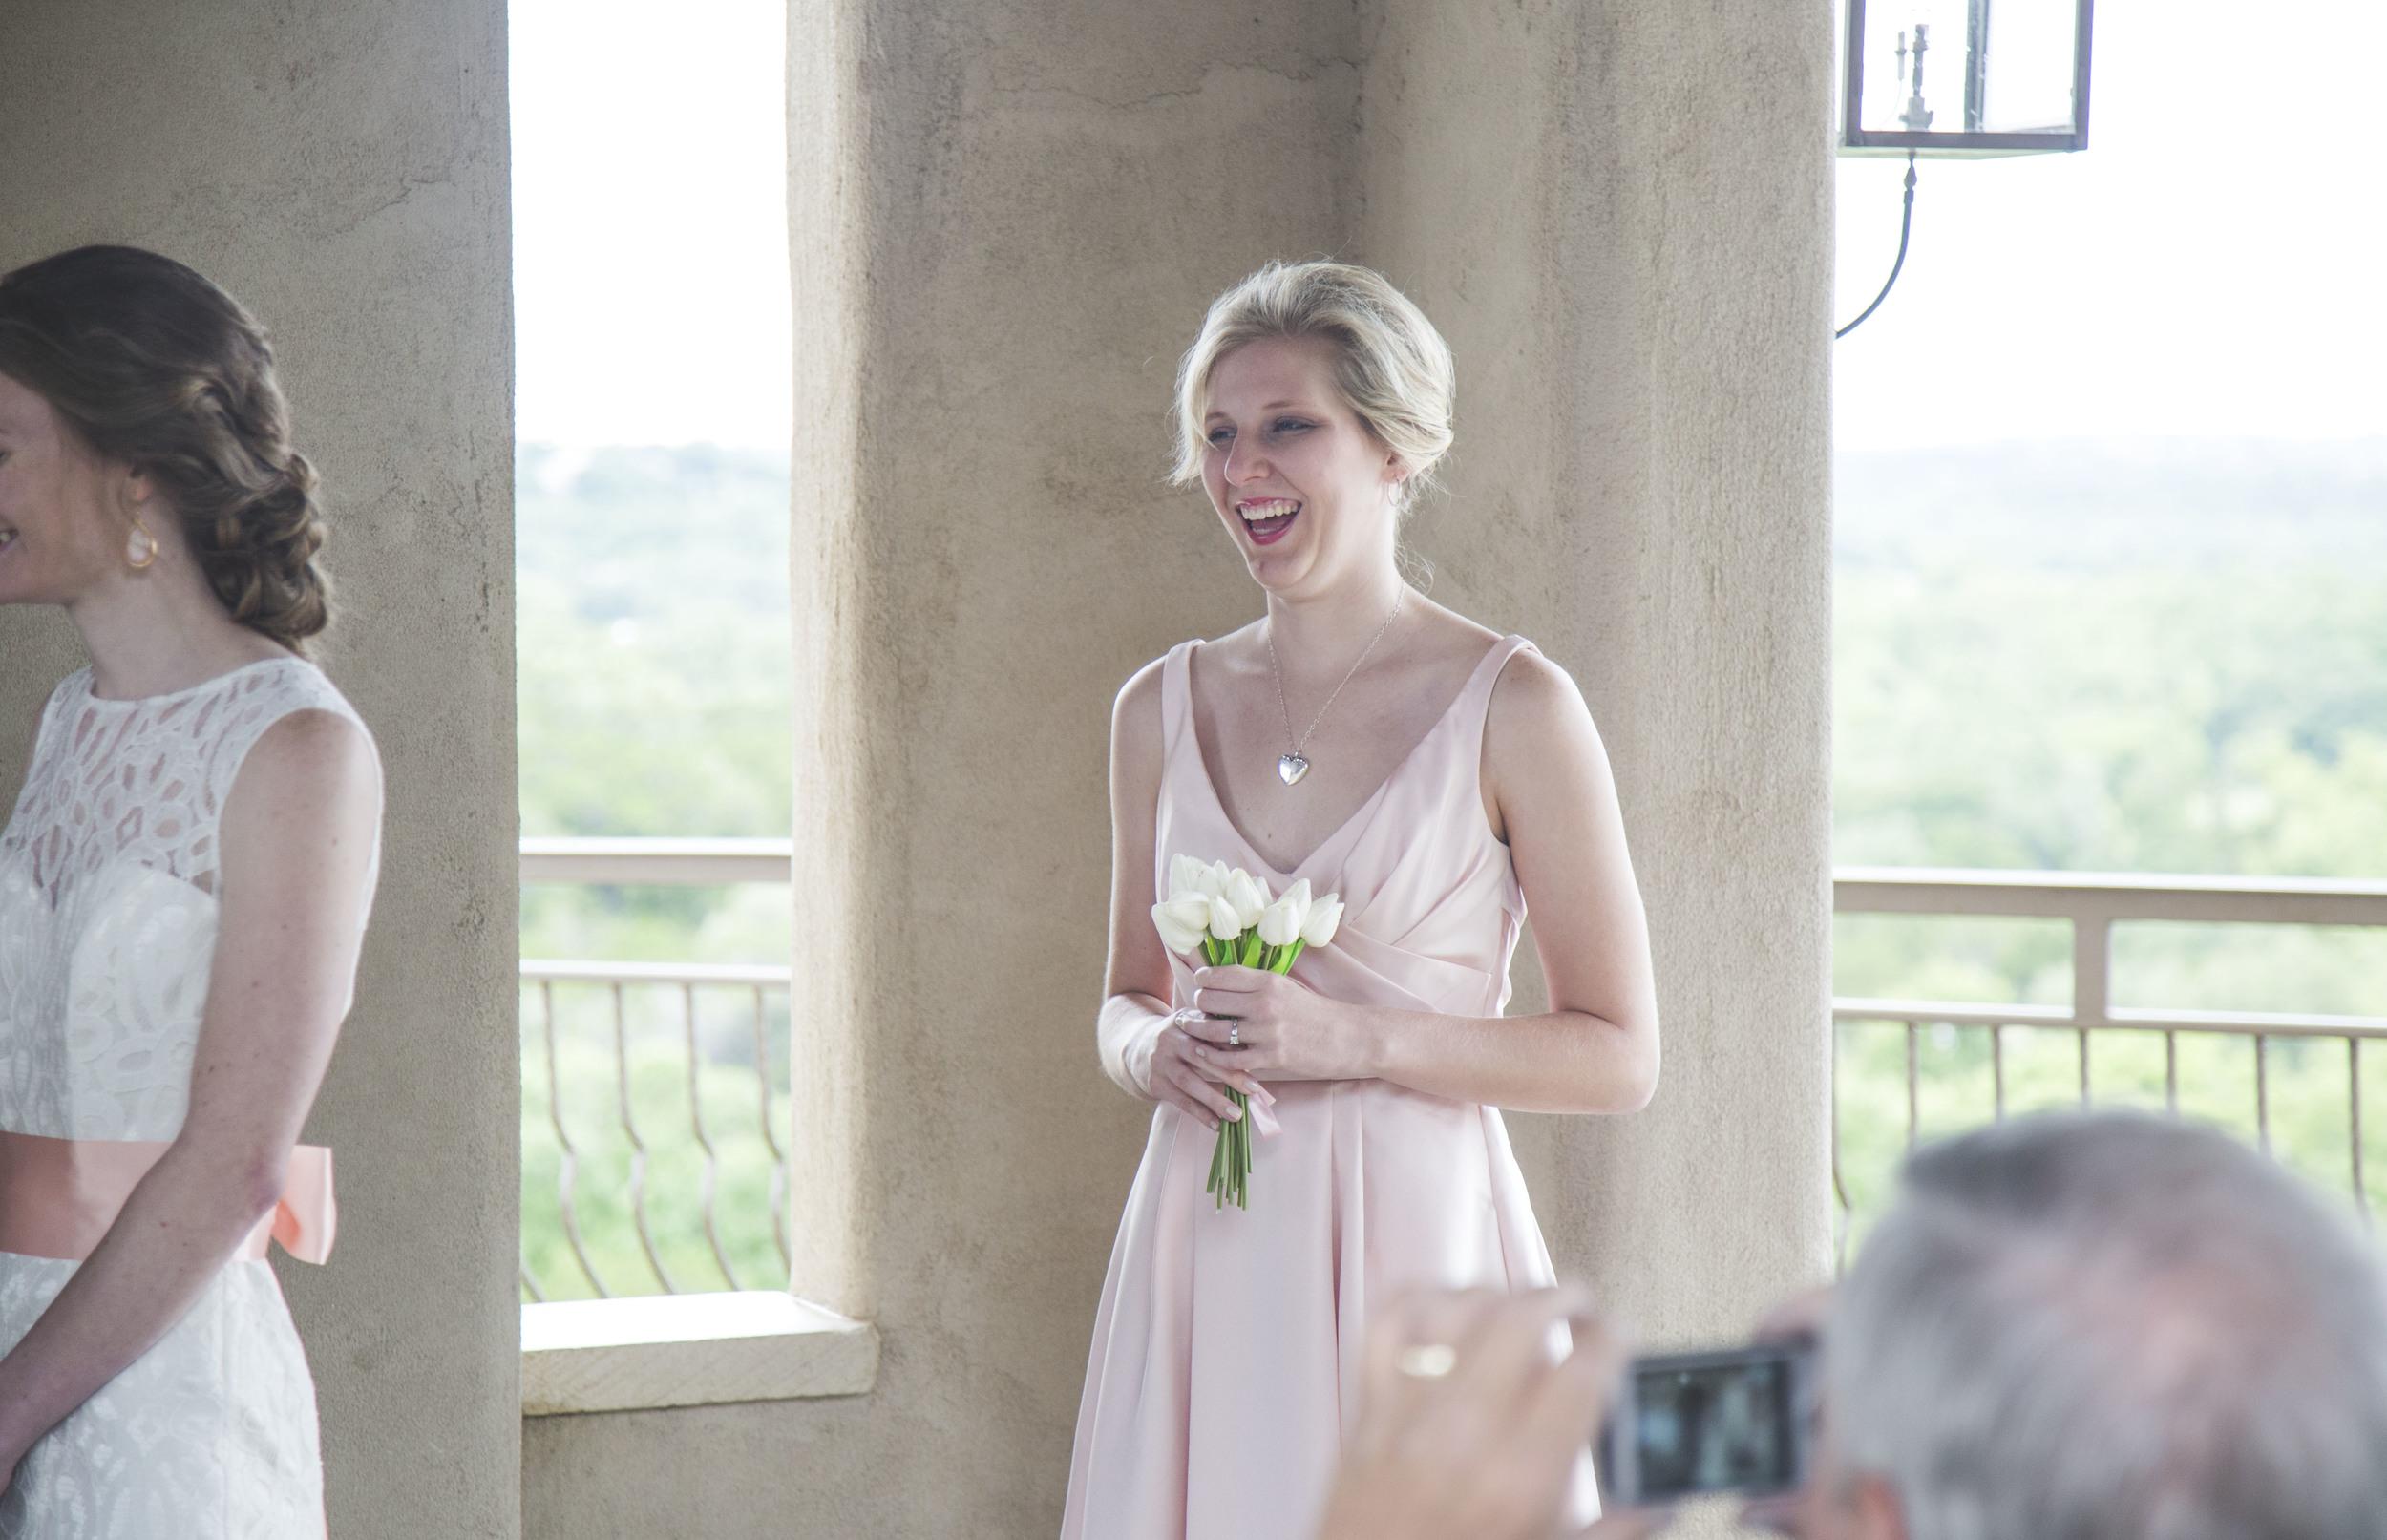 ATGI_Nicole & Patrick Wedding_2016_2S8A6423.jpg